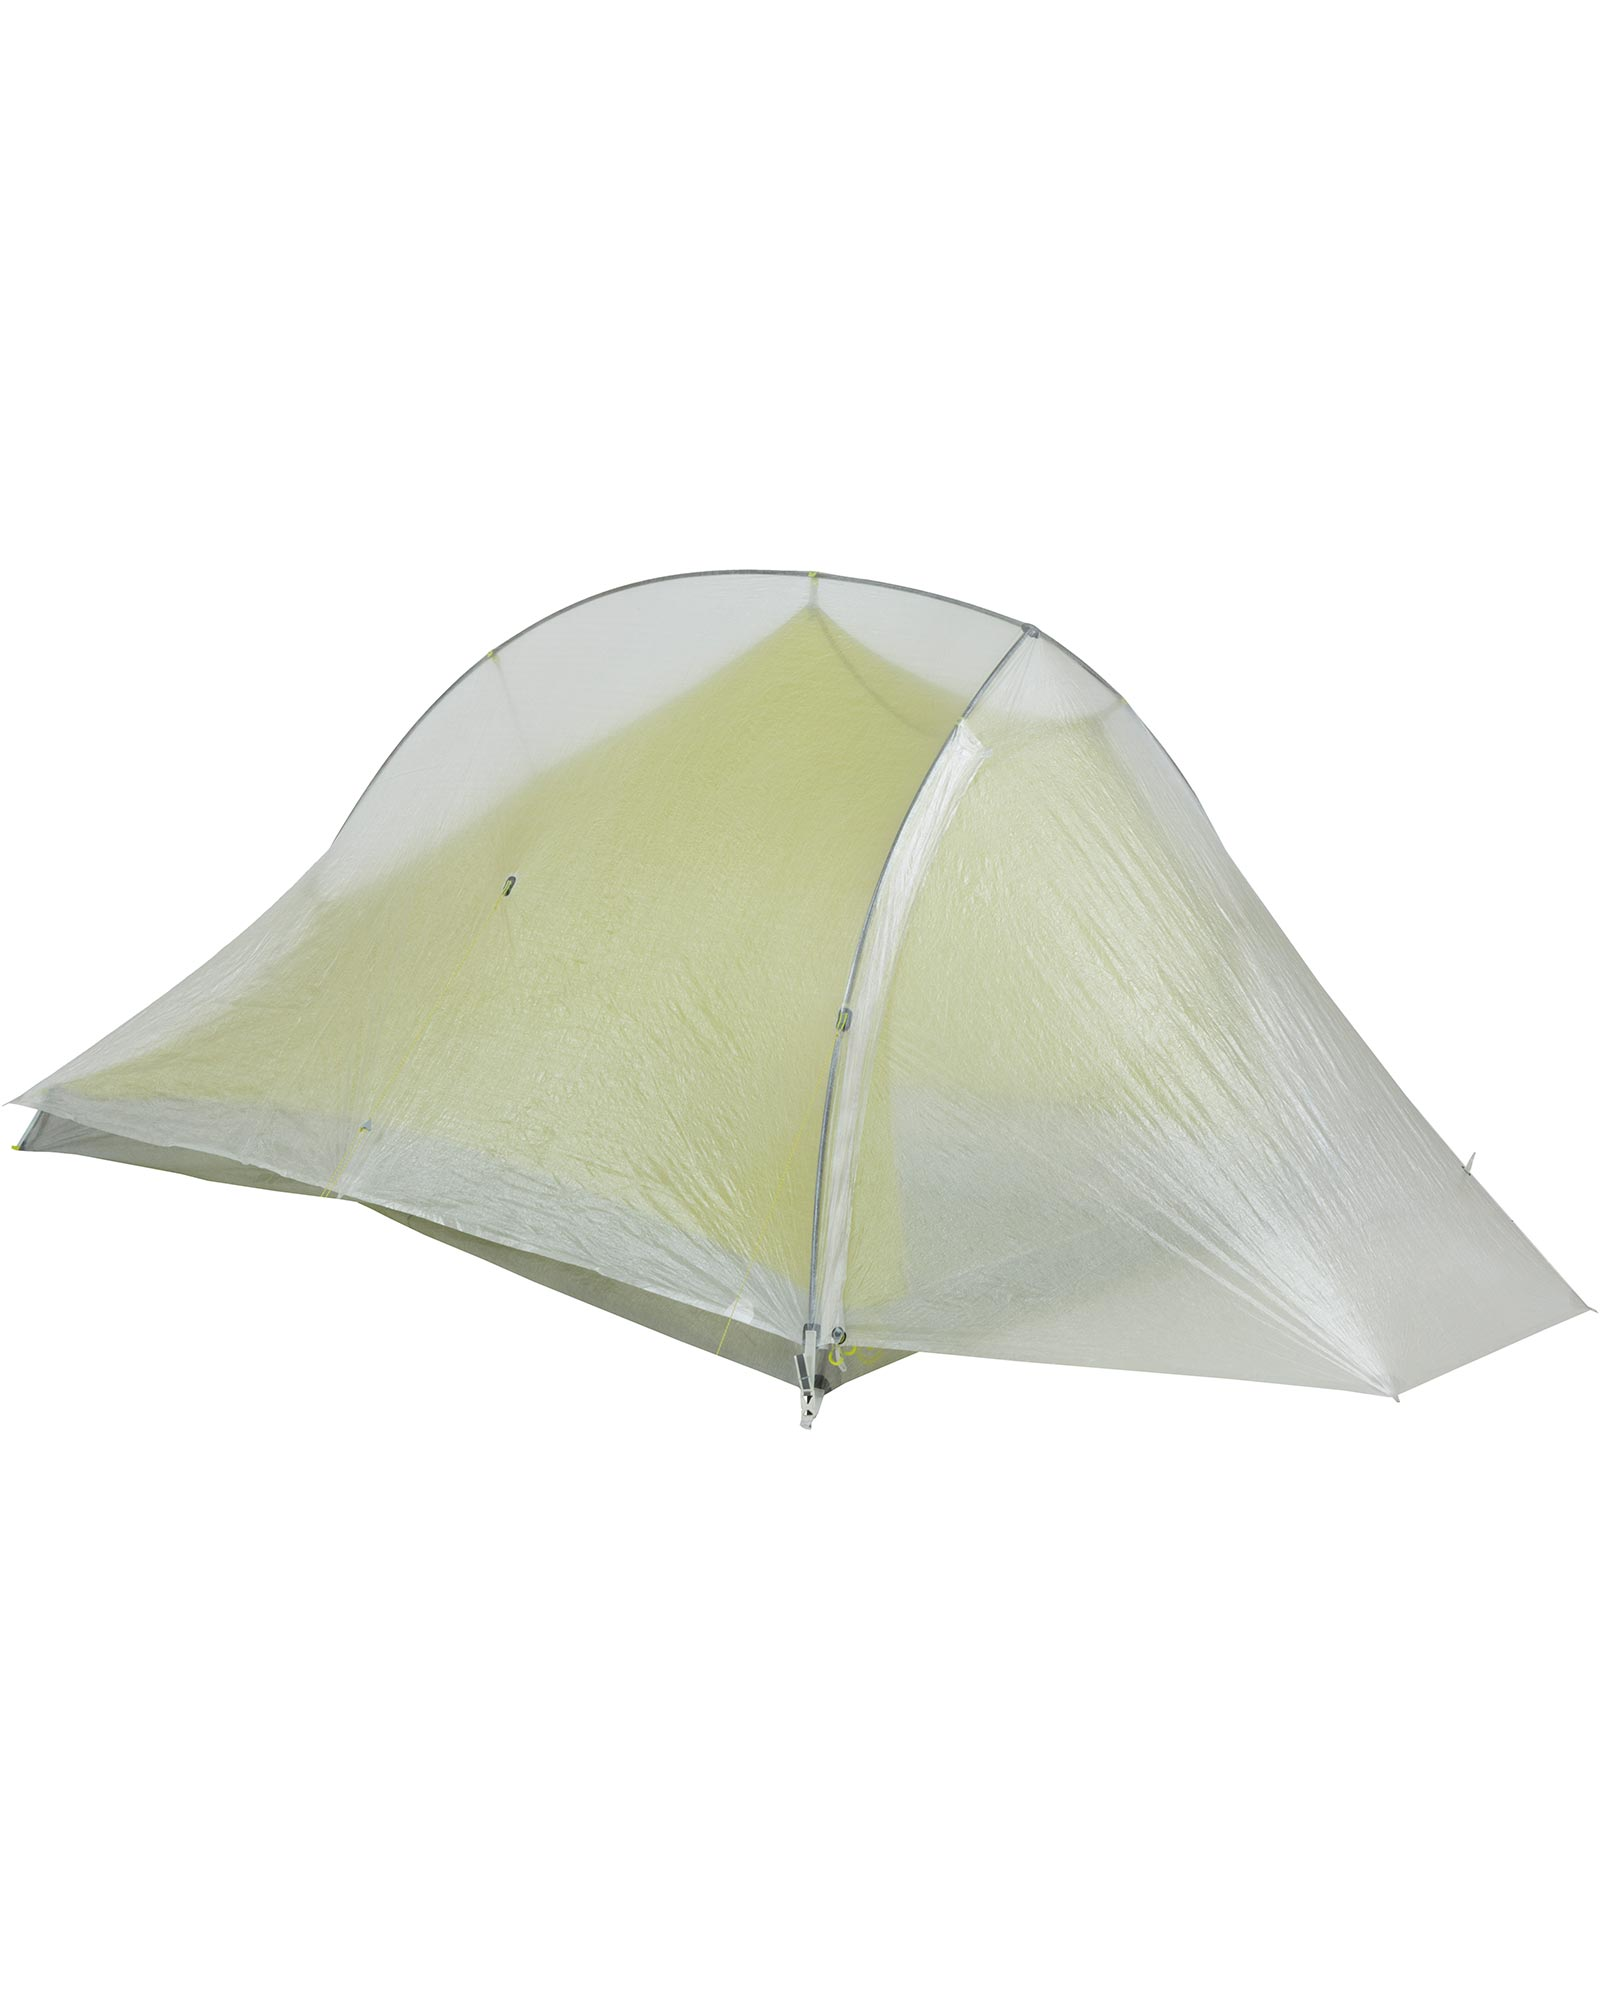 Big Agnes Fly Creek HV 2 Carbon Tent 0